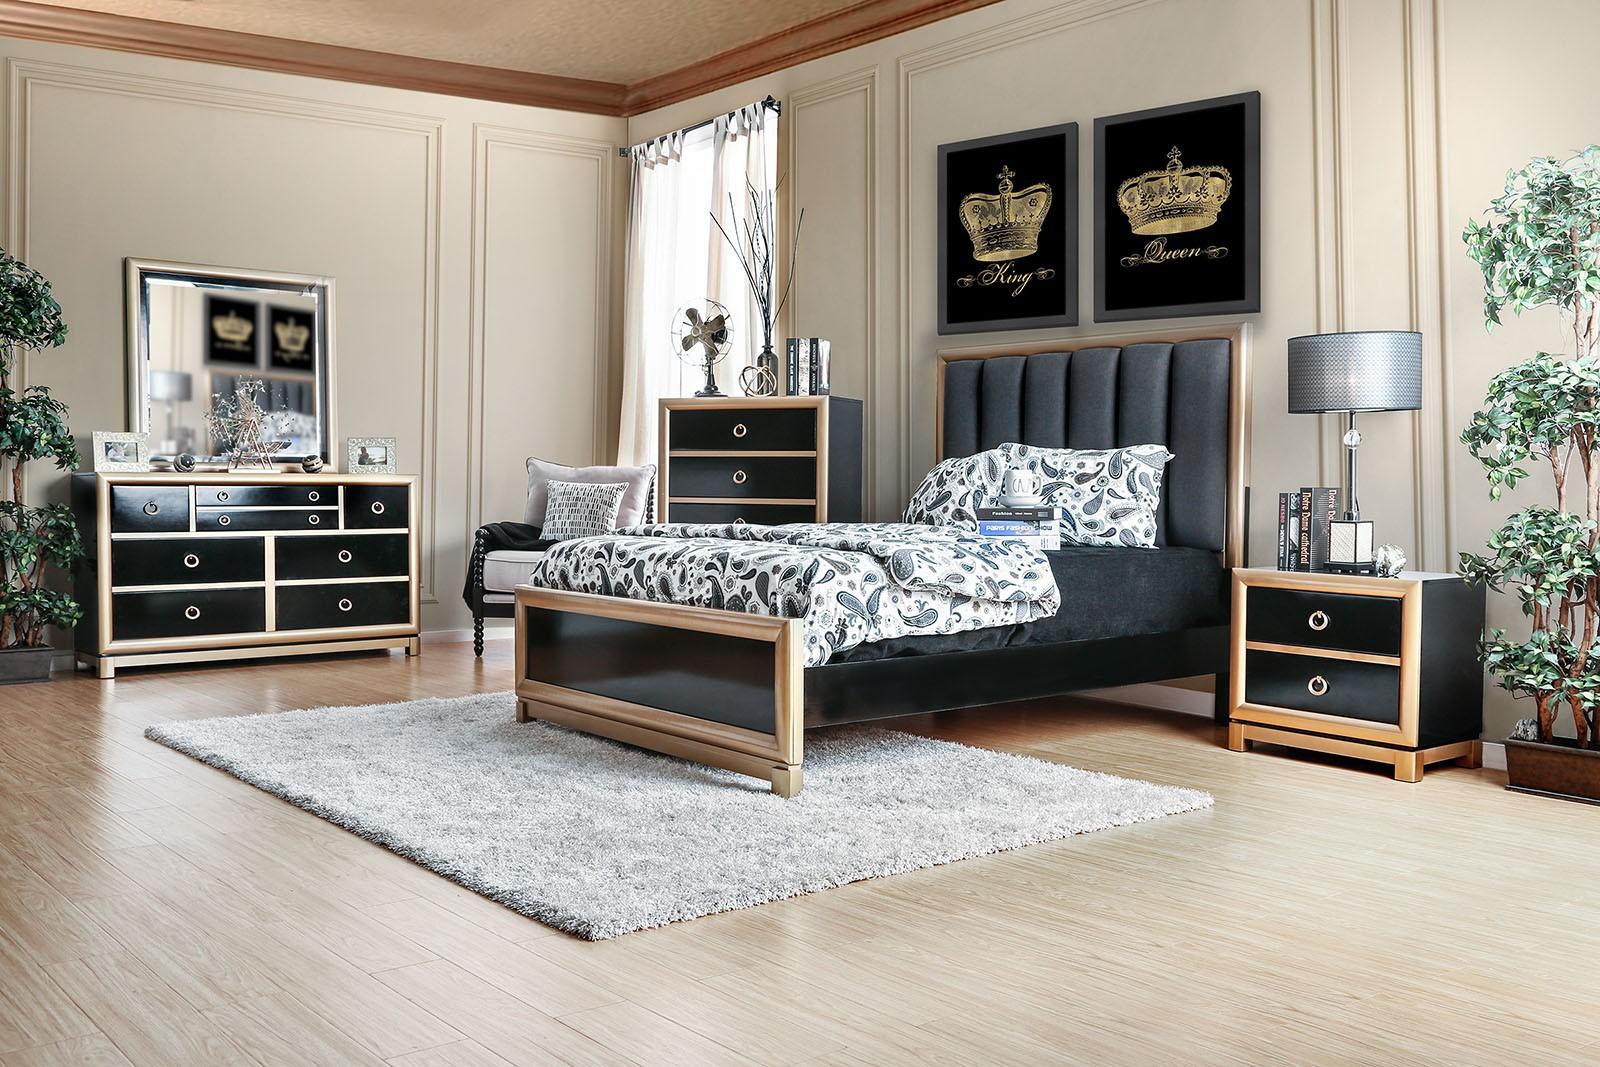 Black And Gold Color Est King Size Bed Dresser Mirror Nightstand 4pc Bedroom Set